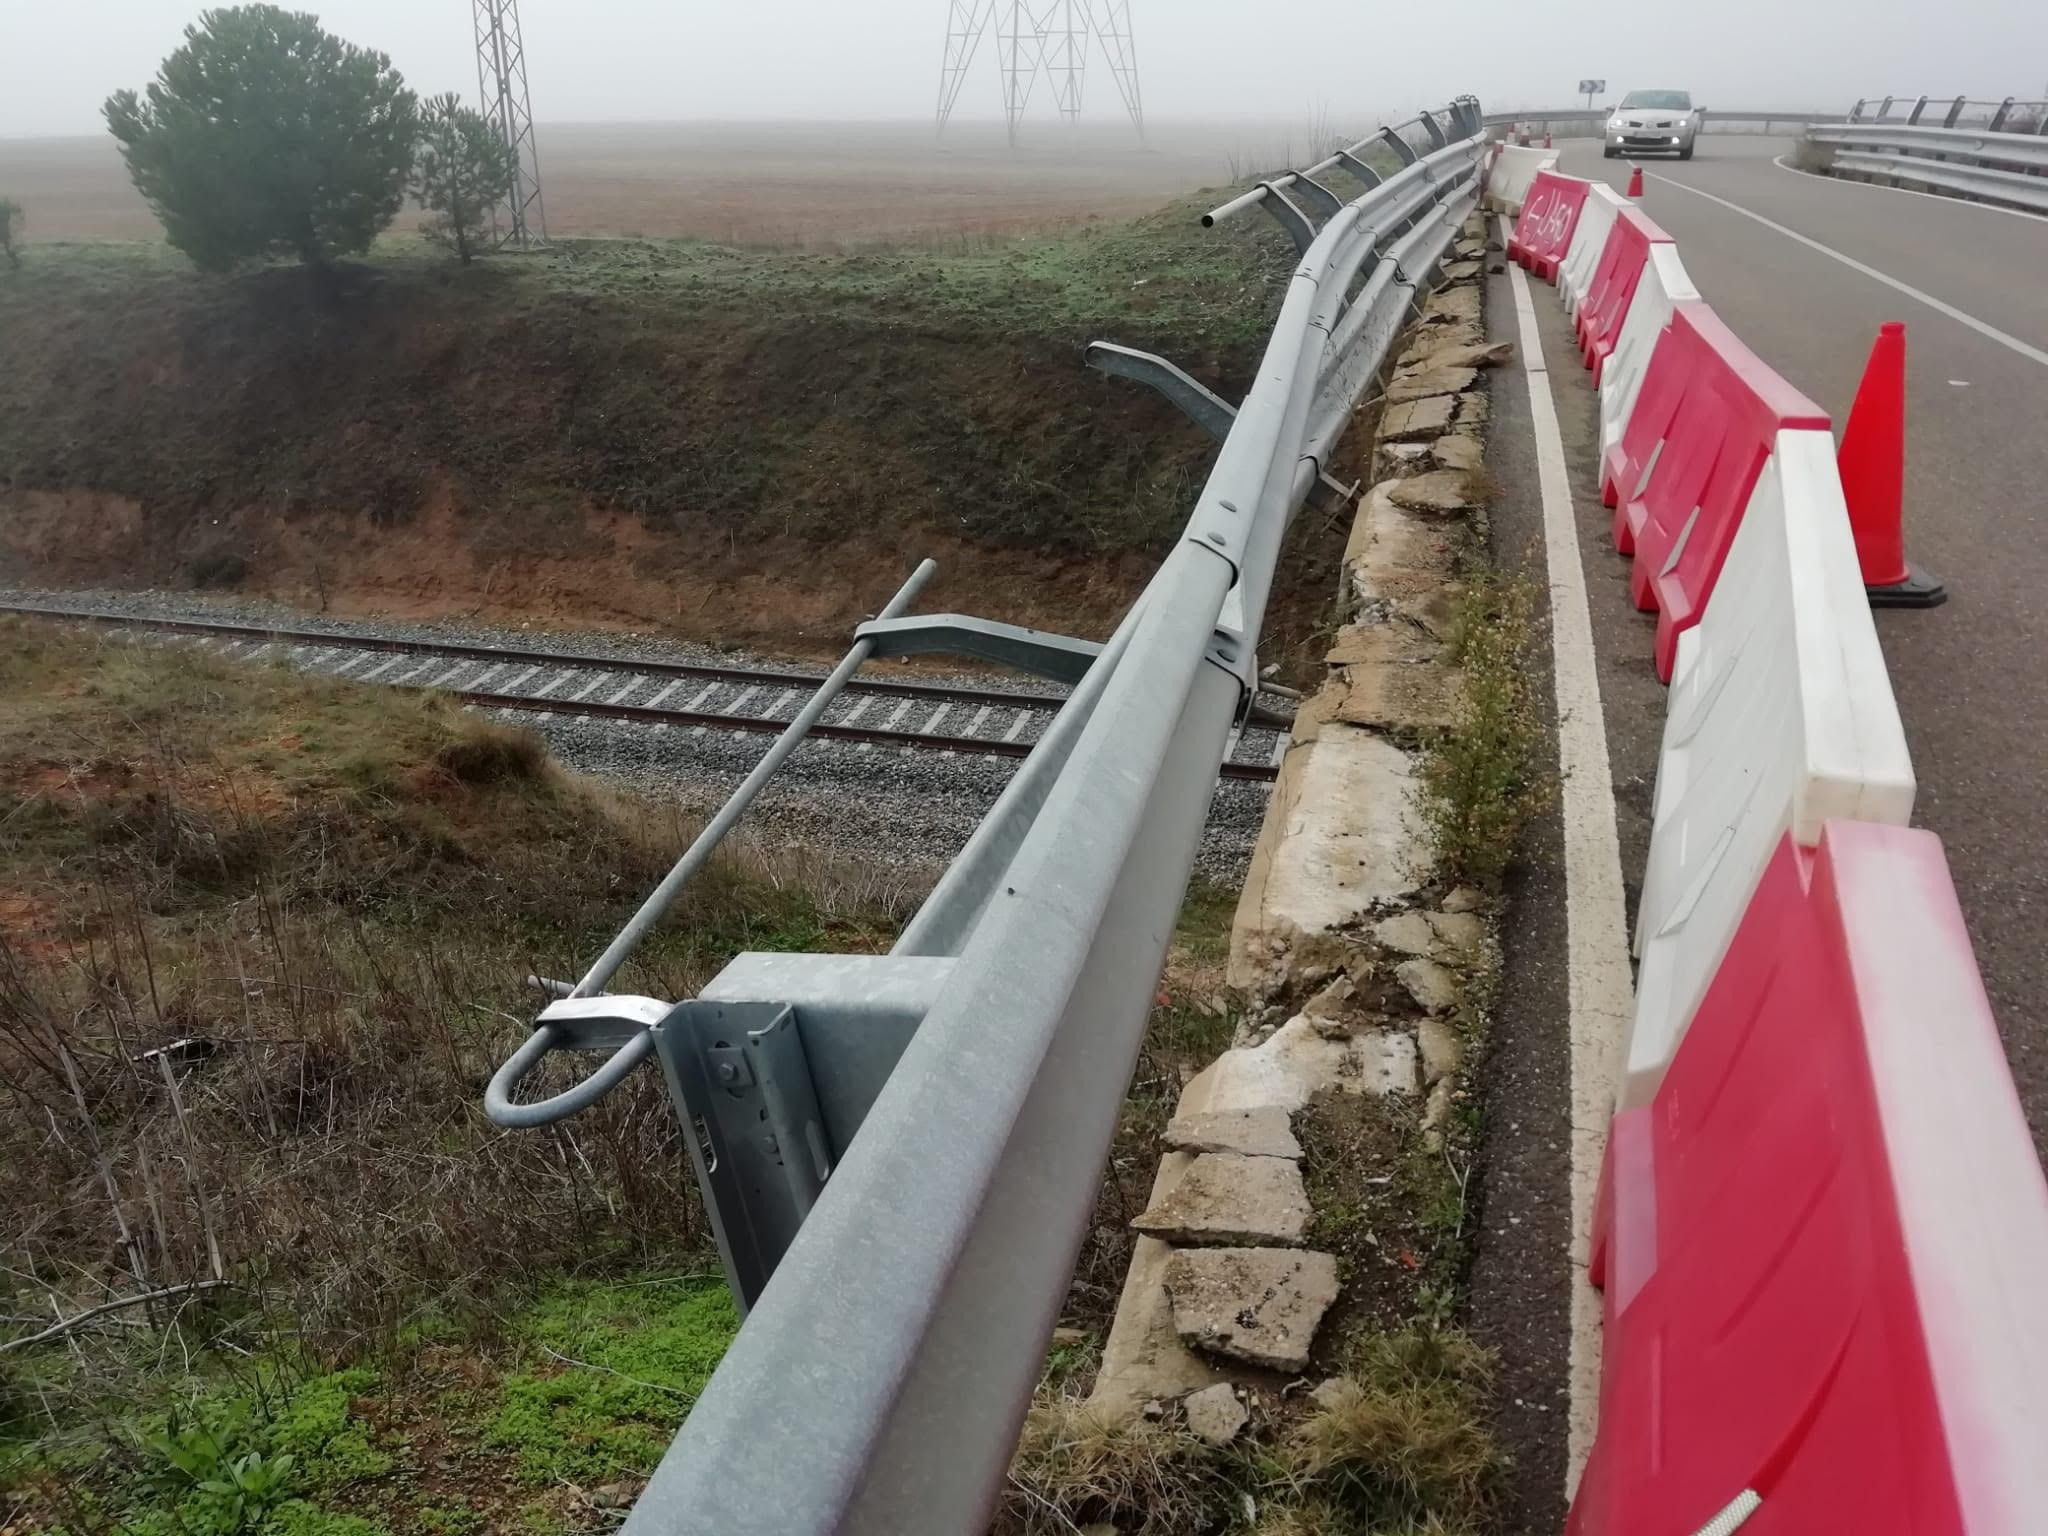 Andavias viaducto tren psoe accidente (5)